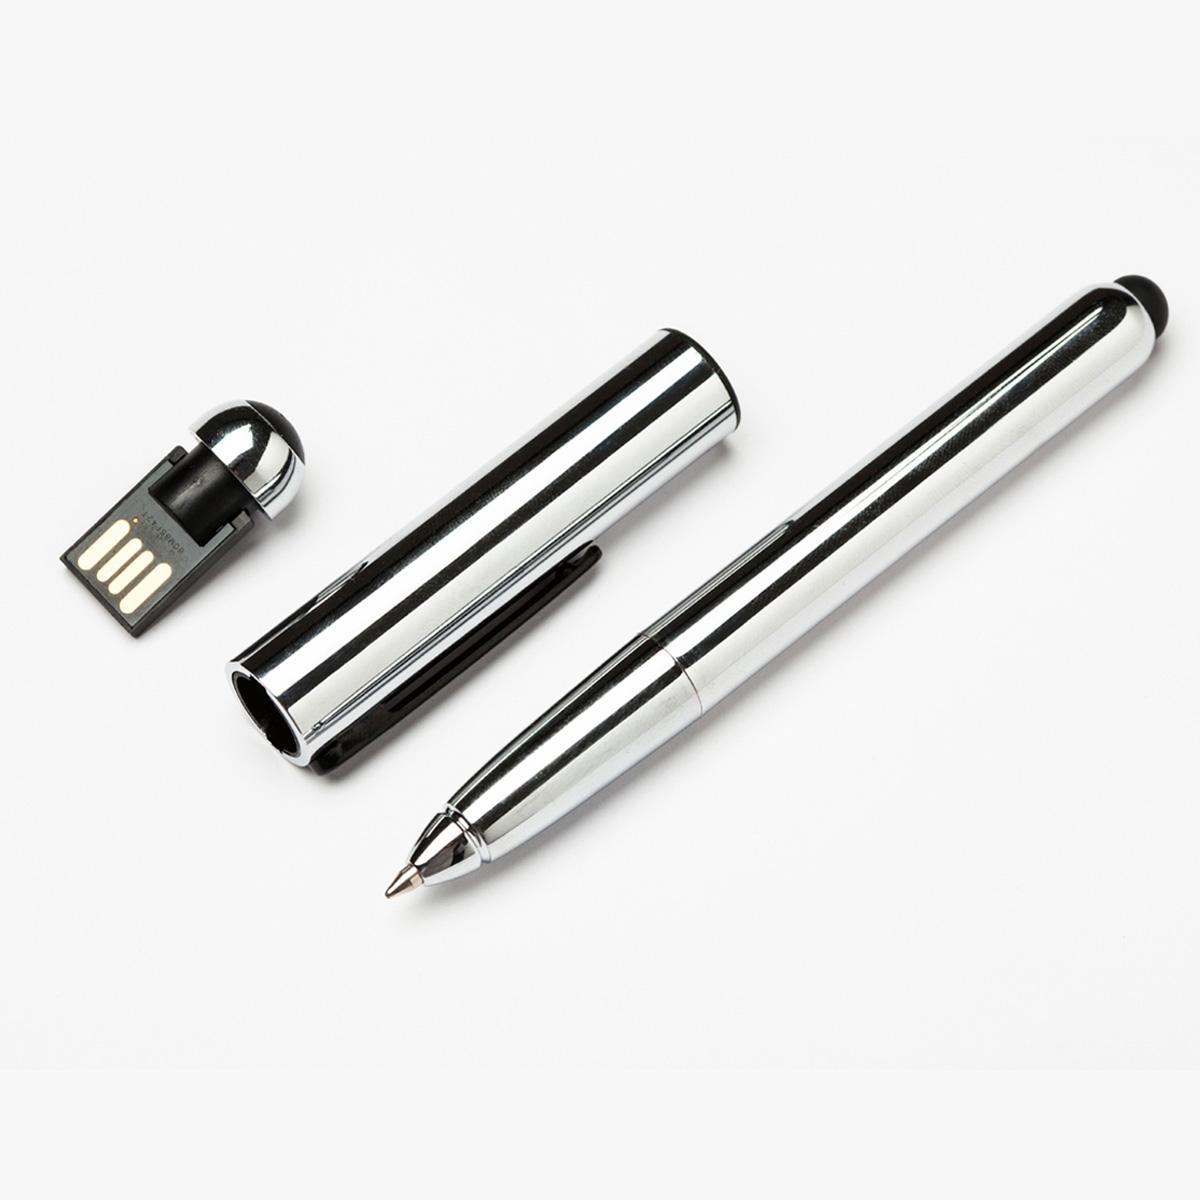 USB otg olovka U6000